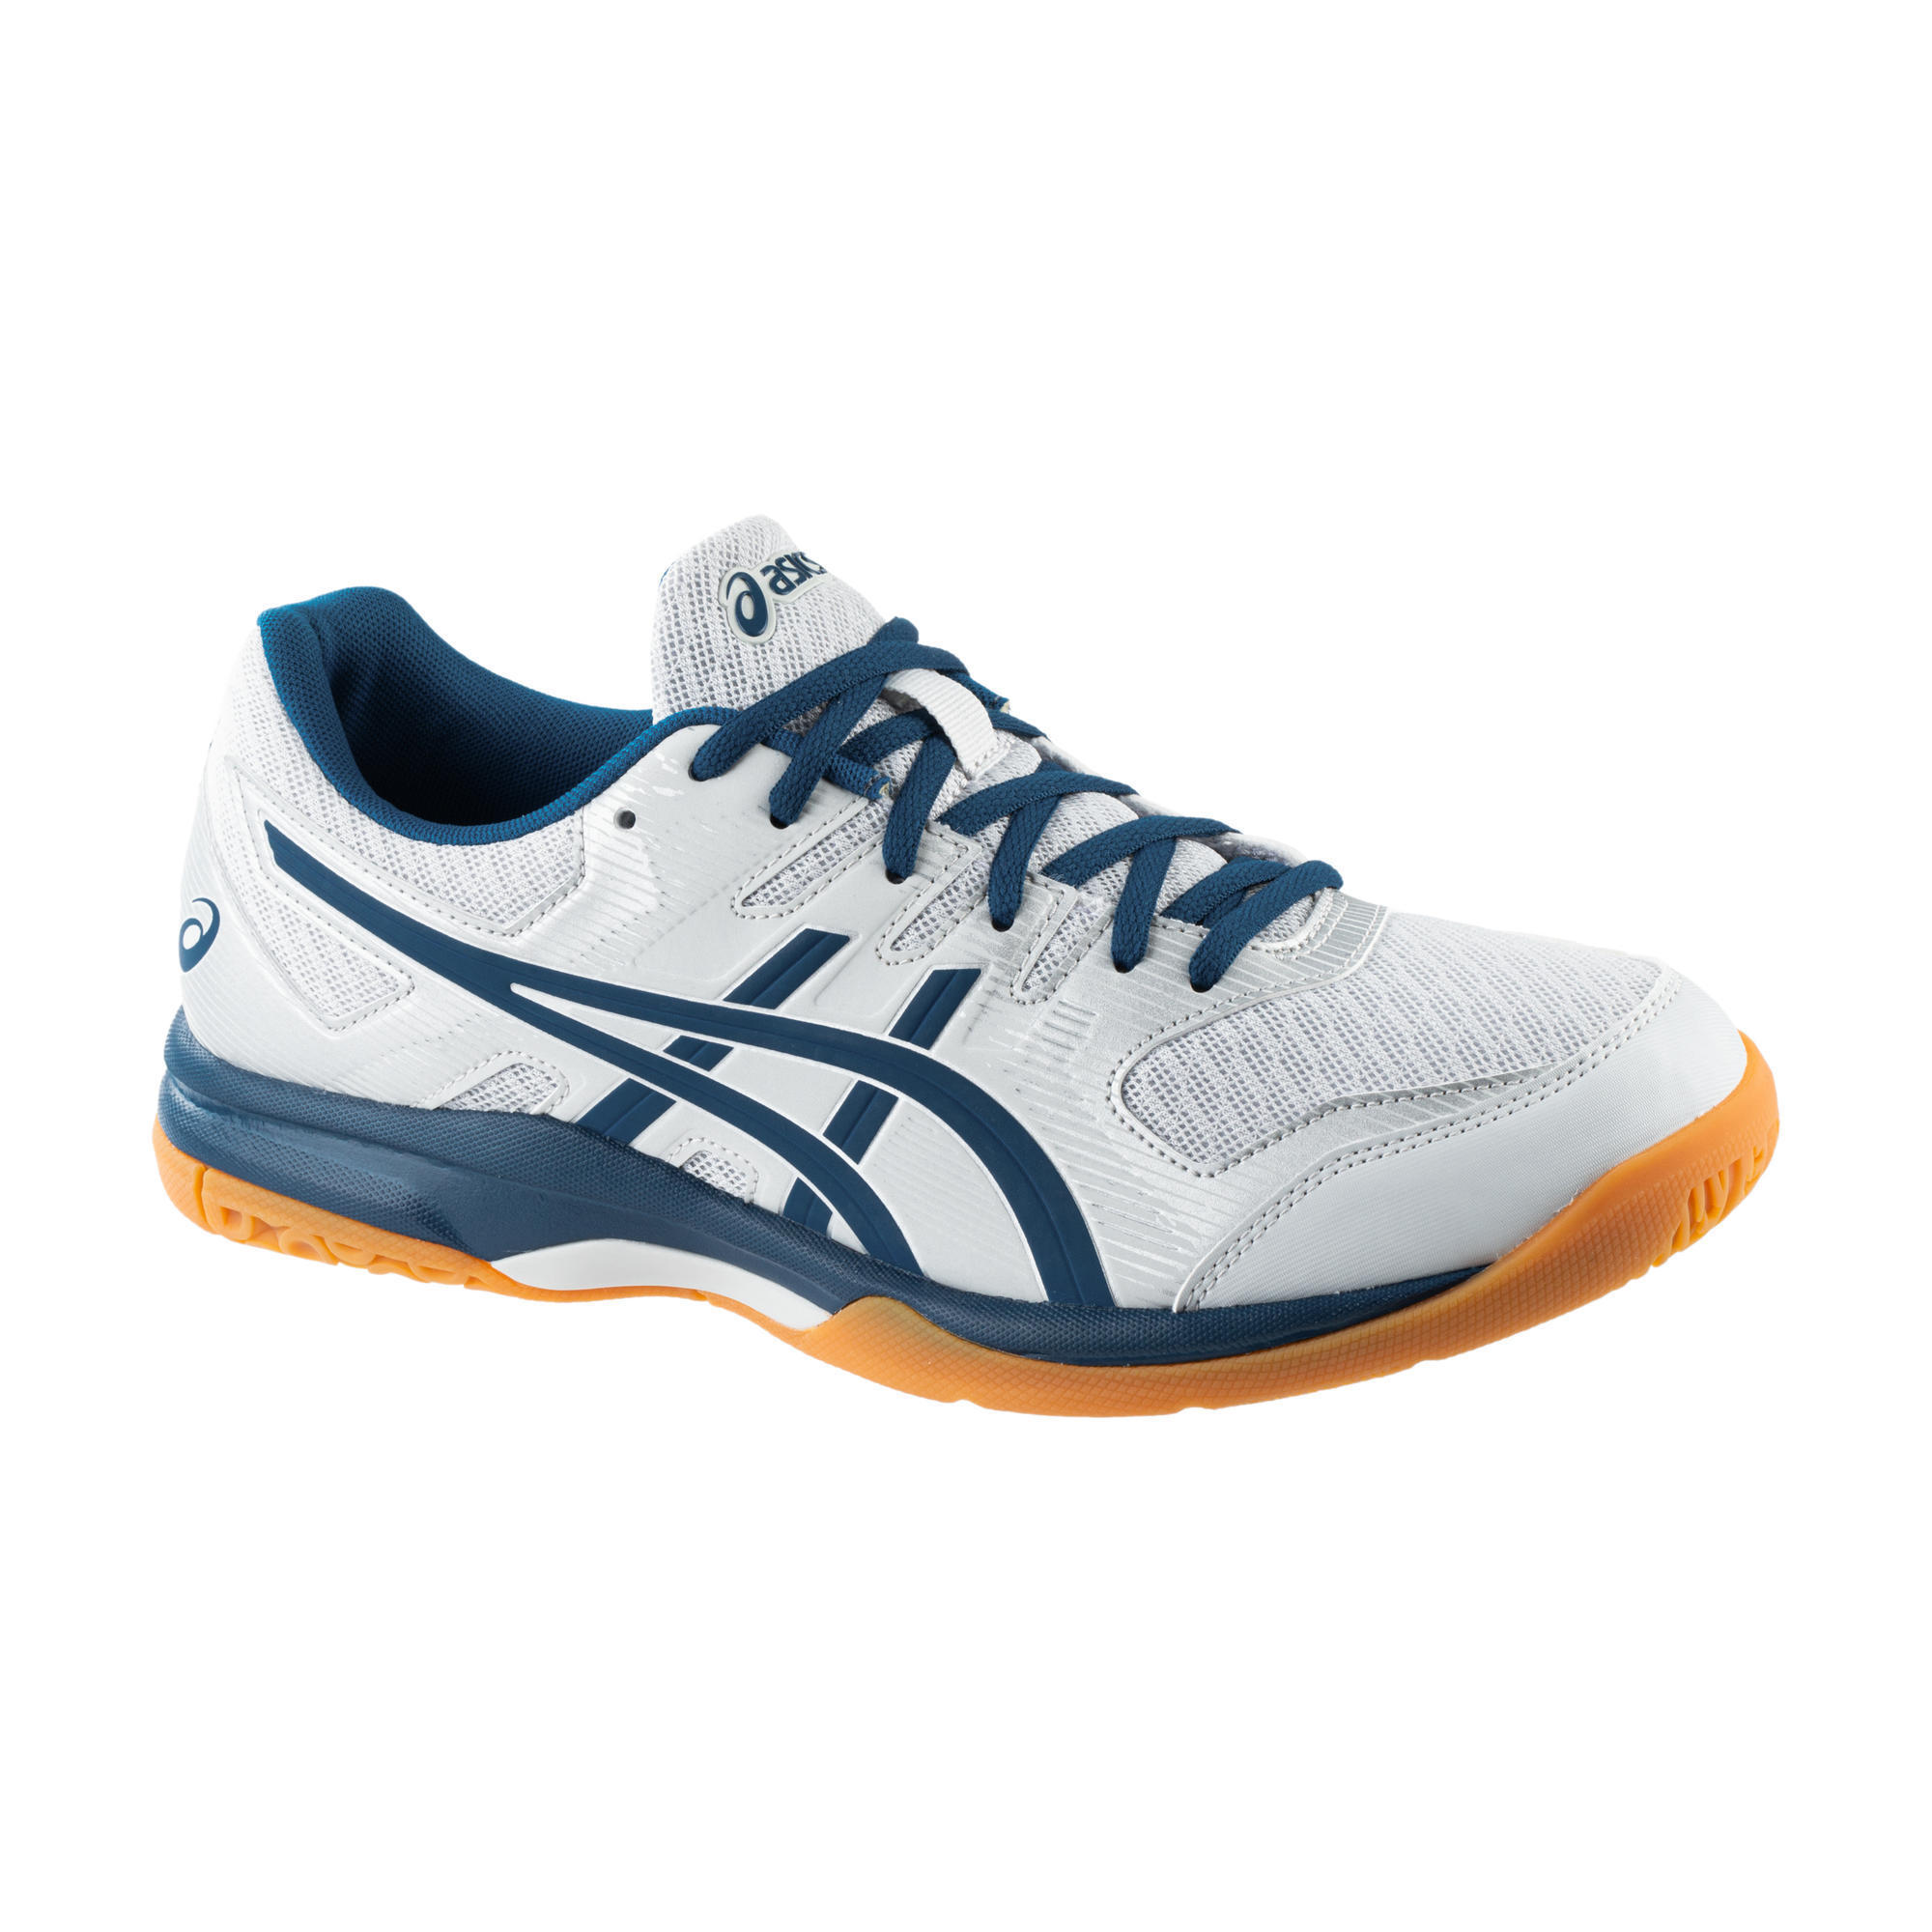 Chaussures de Badminton, Squash et Sports indoors Gel Rocket 9 ...